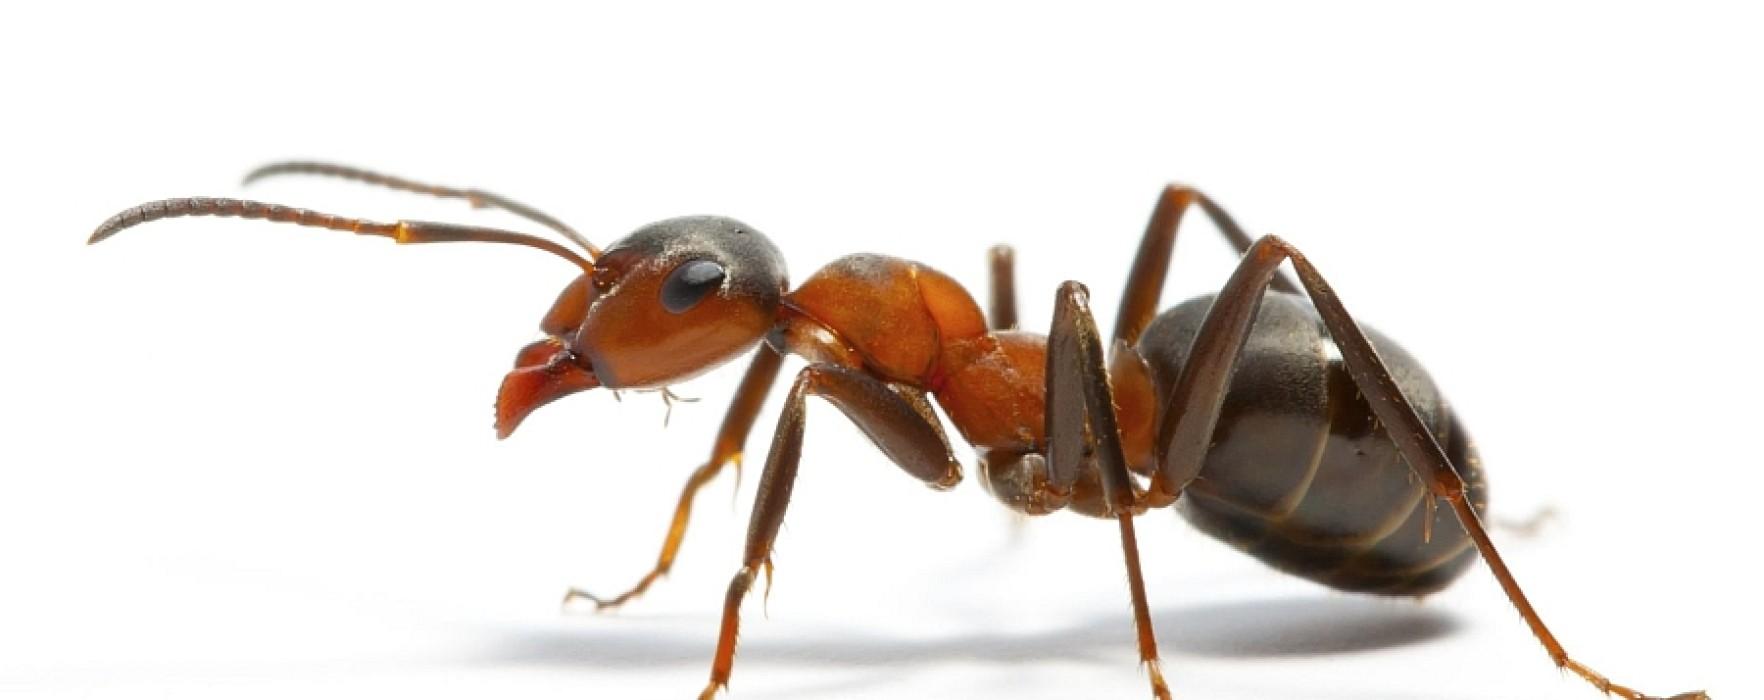 Cum scapi de furnici cu soluţii naturale